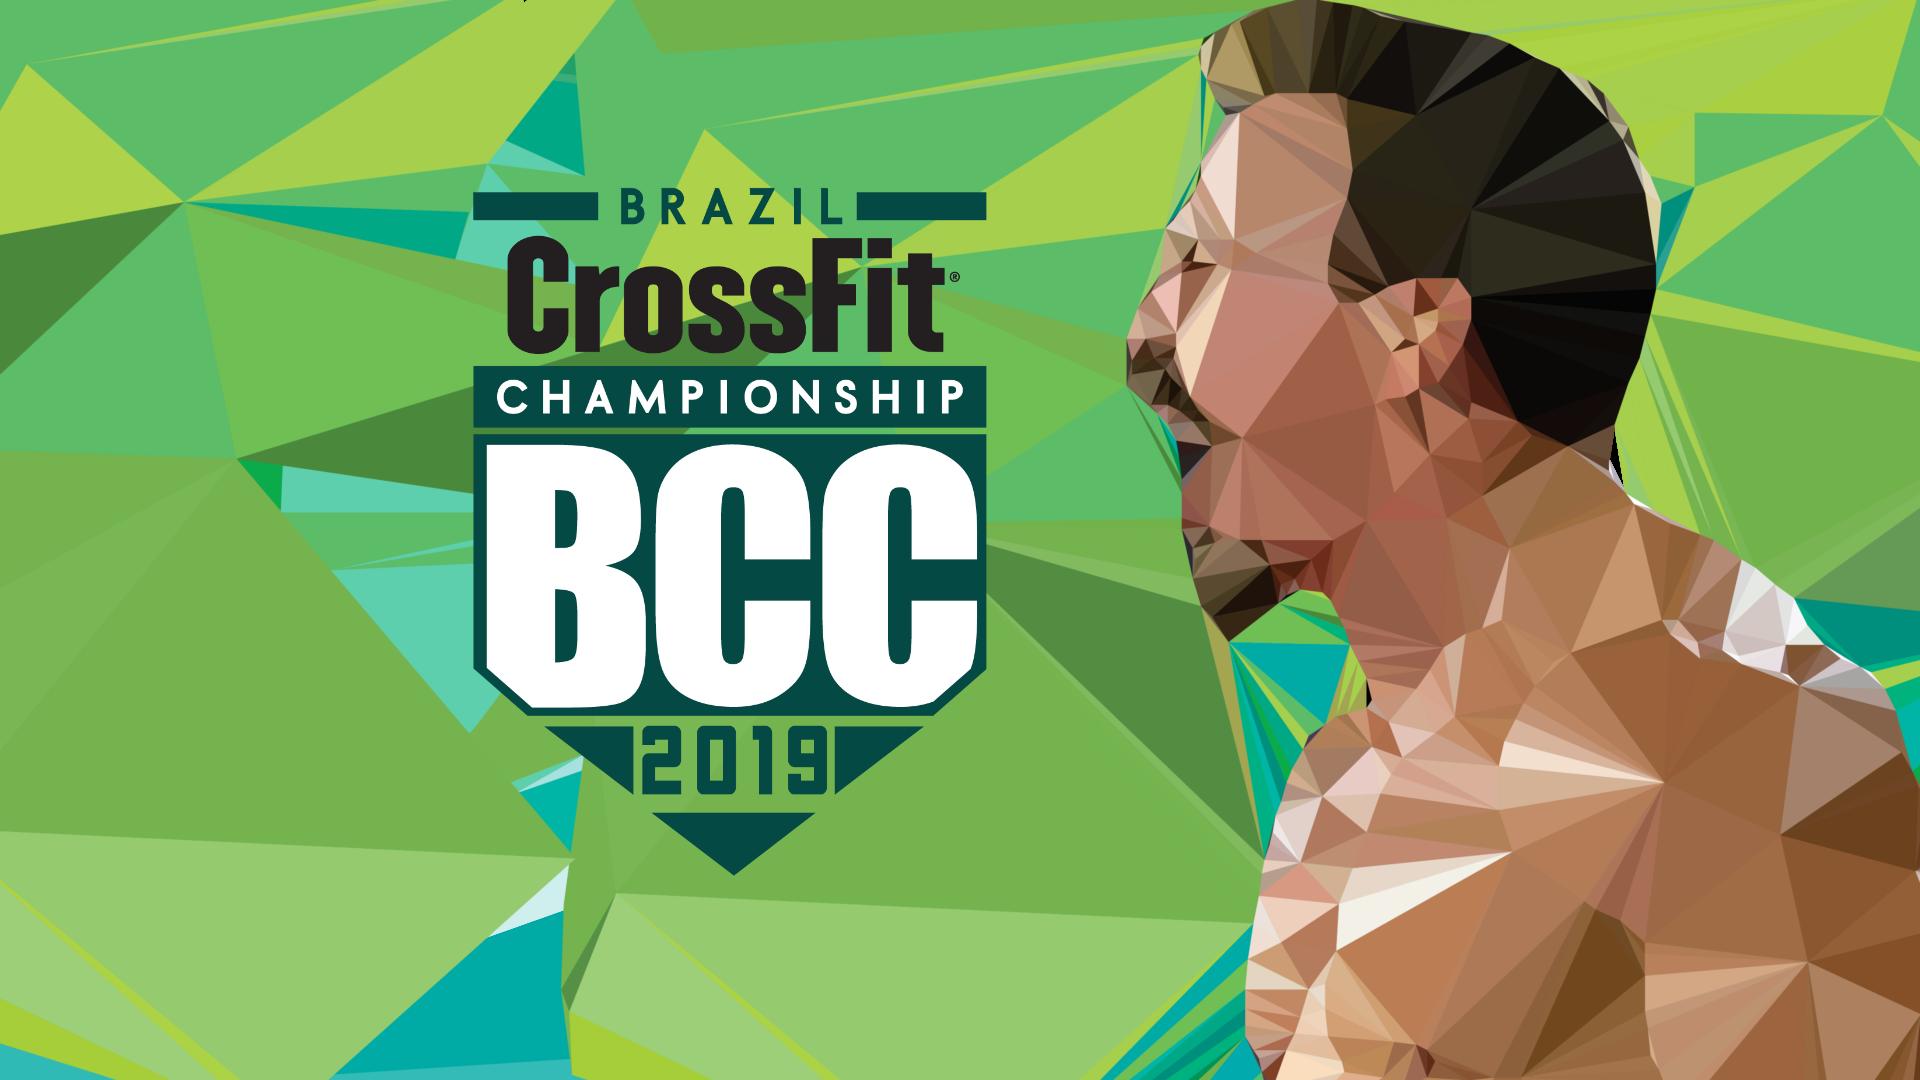 Brazil CrossFit Championship: veja os classificados